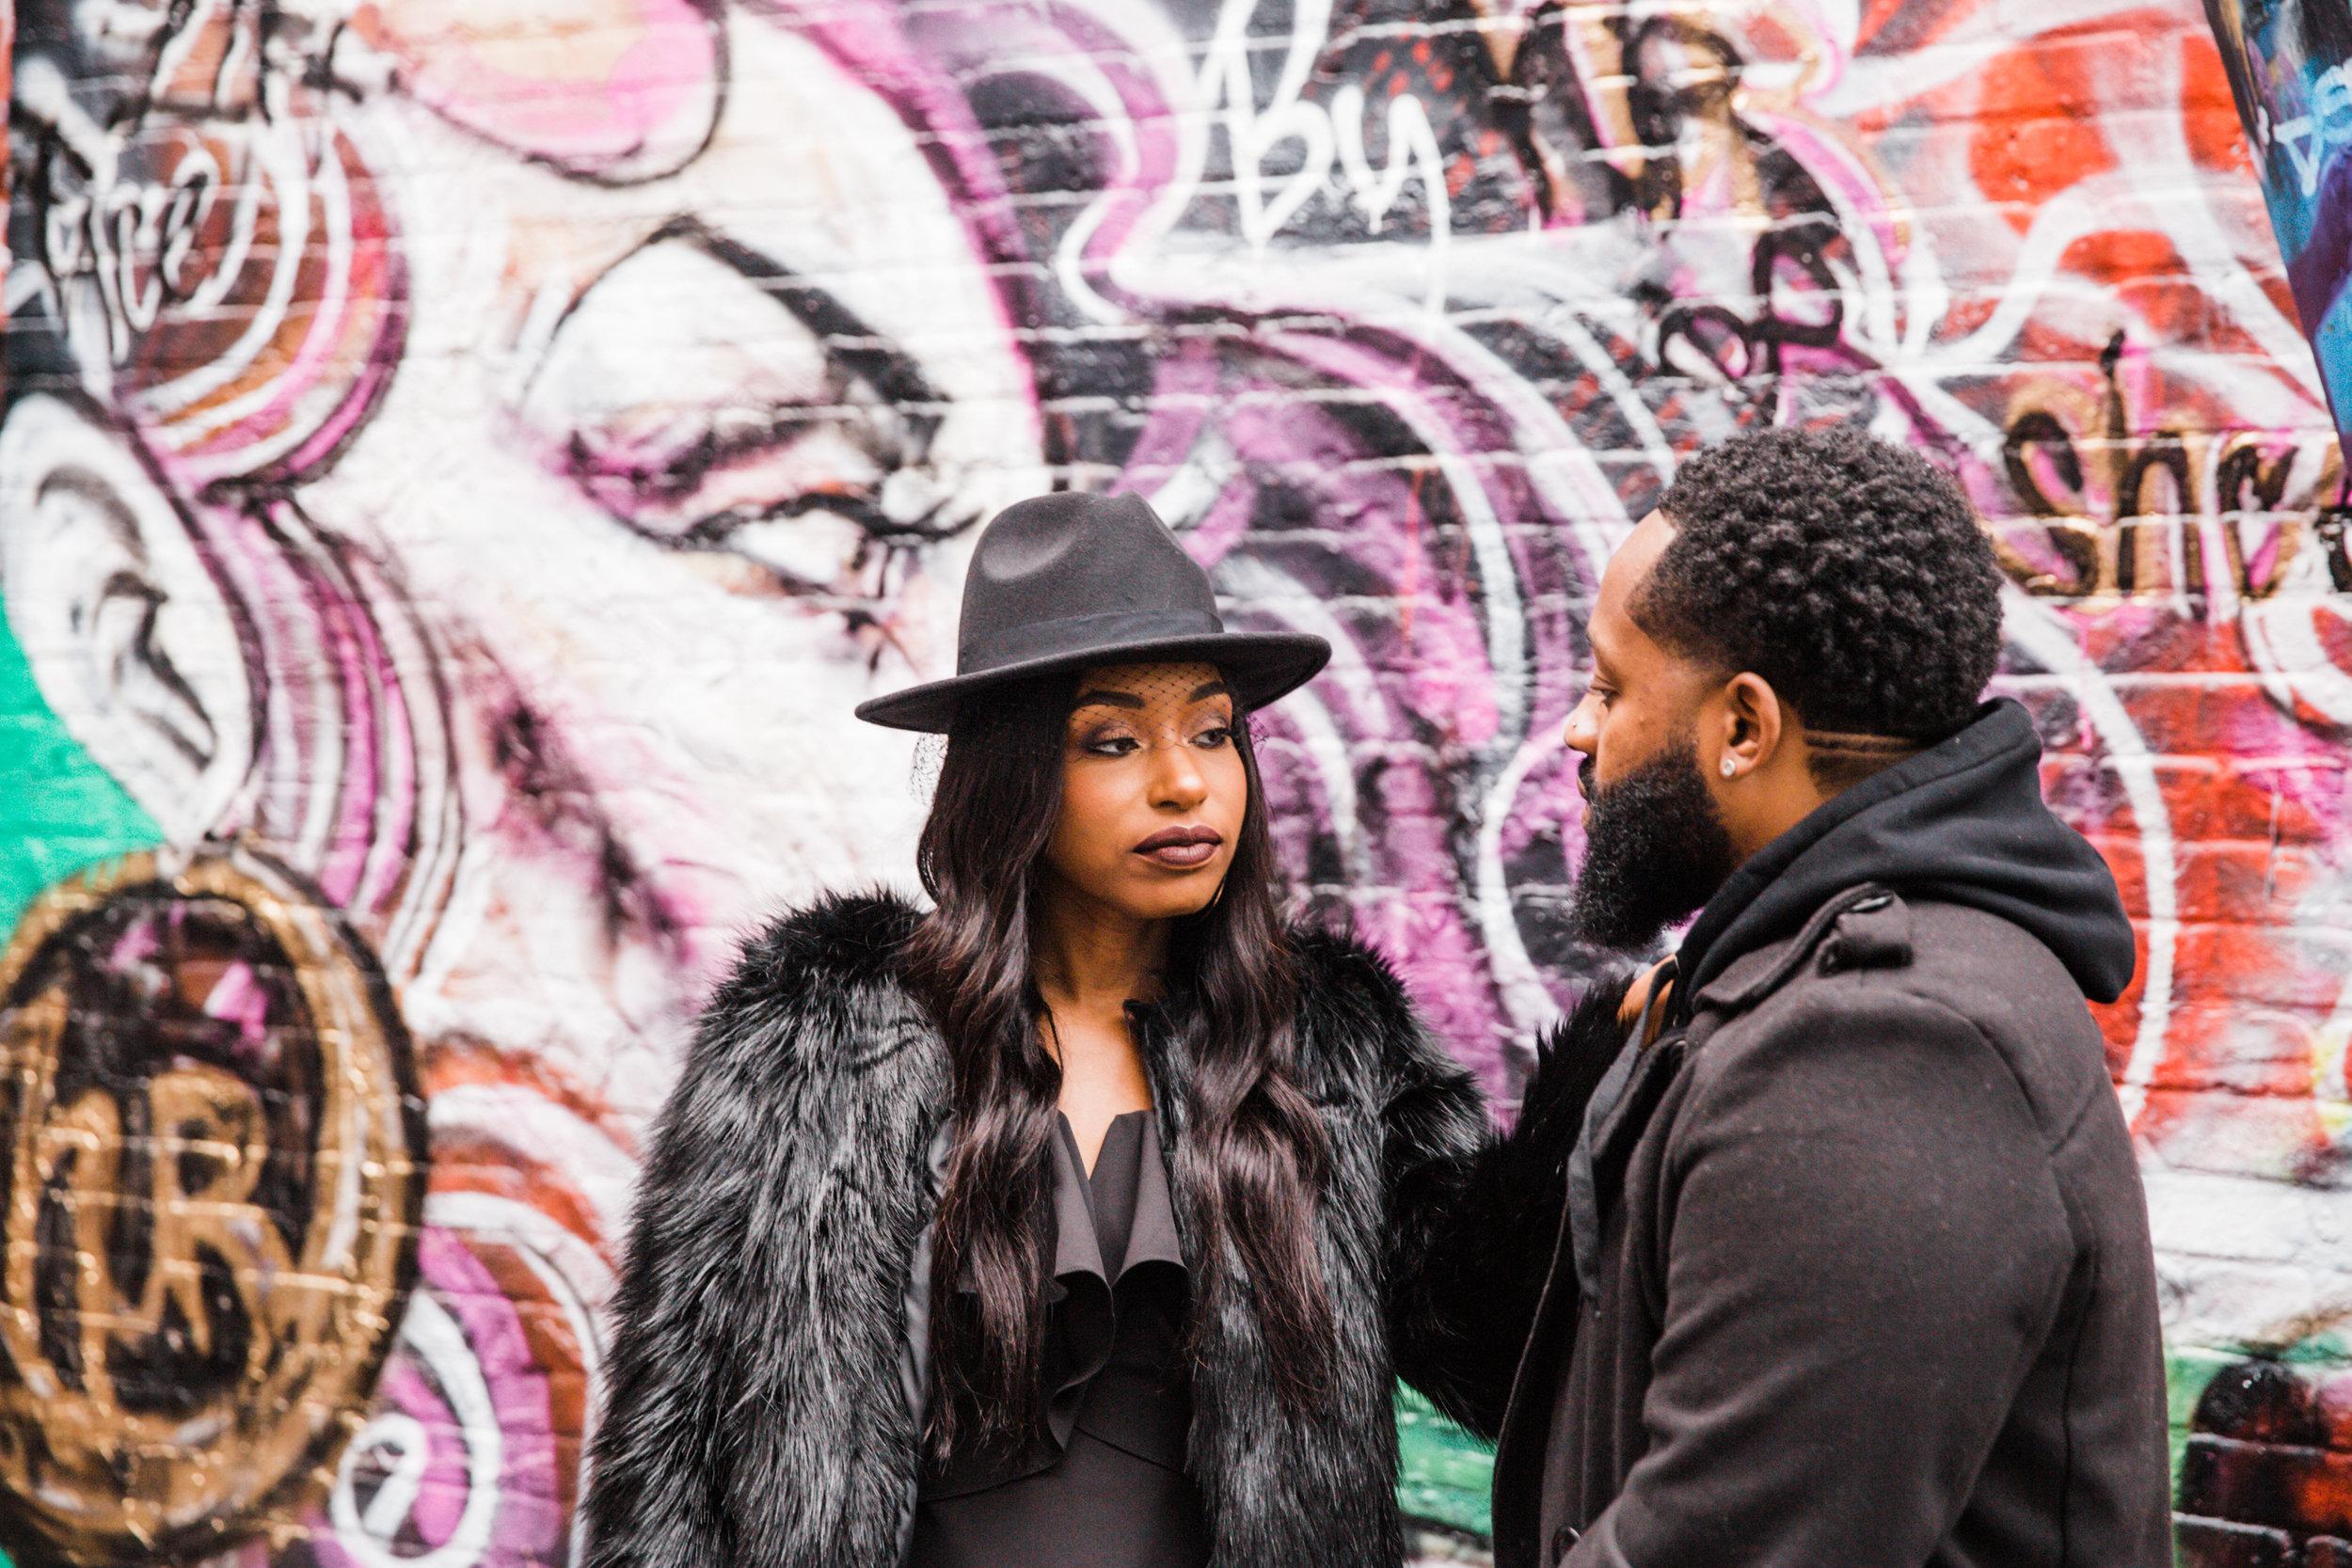 Creative Baltimore Graffiti Alley Engagement Session Megapixels Media Photography-37.jpg